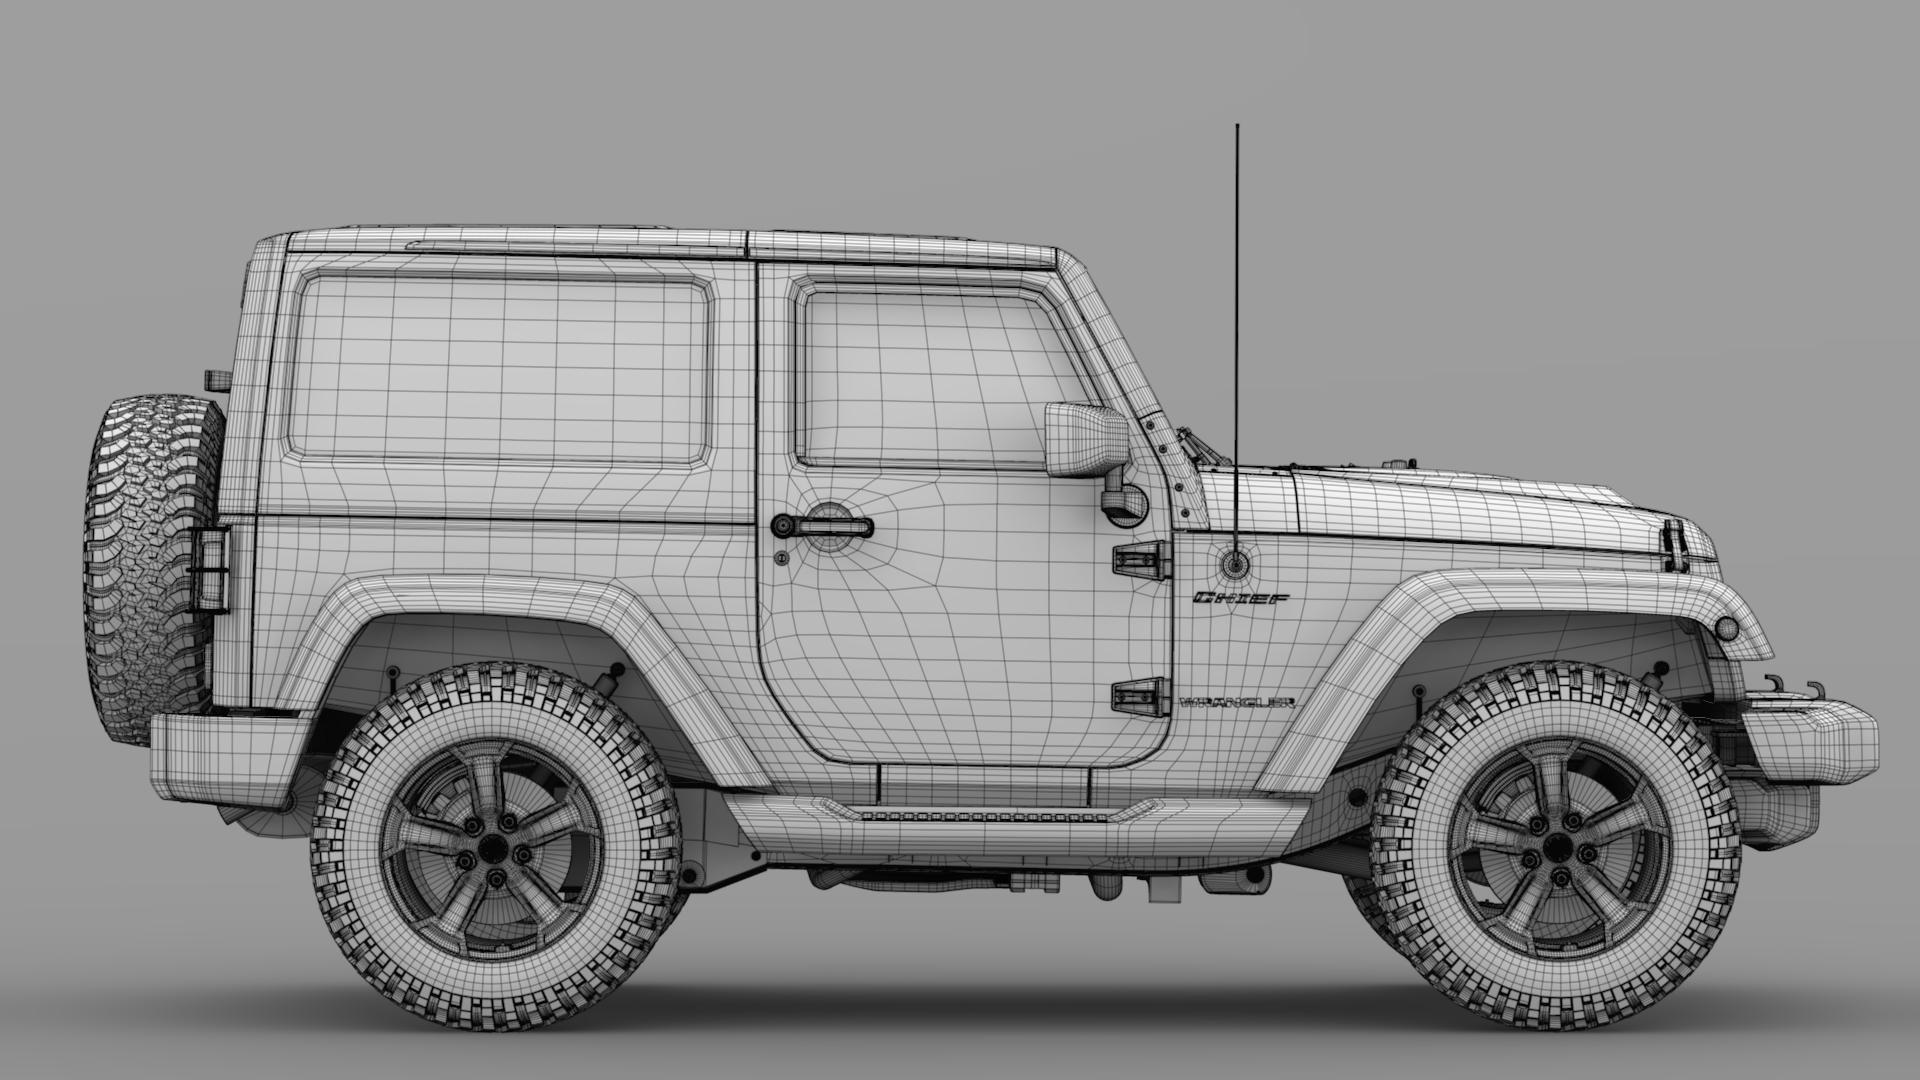 jeep wrangler chief jk 2017 3d model max fbx c4d lwo ma mb hrc xsi obj 276896